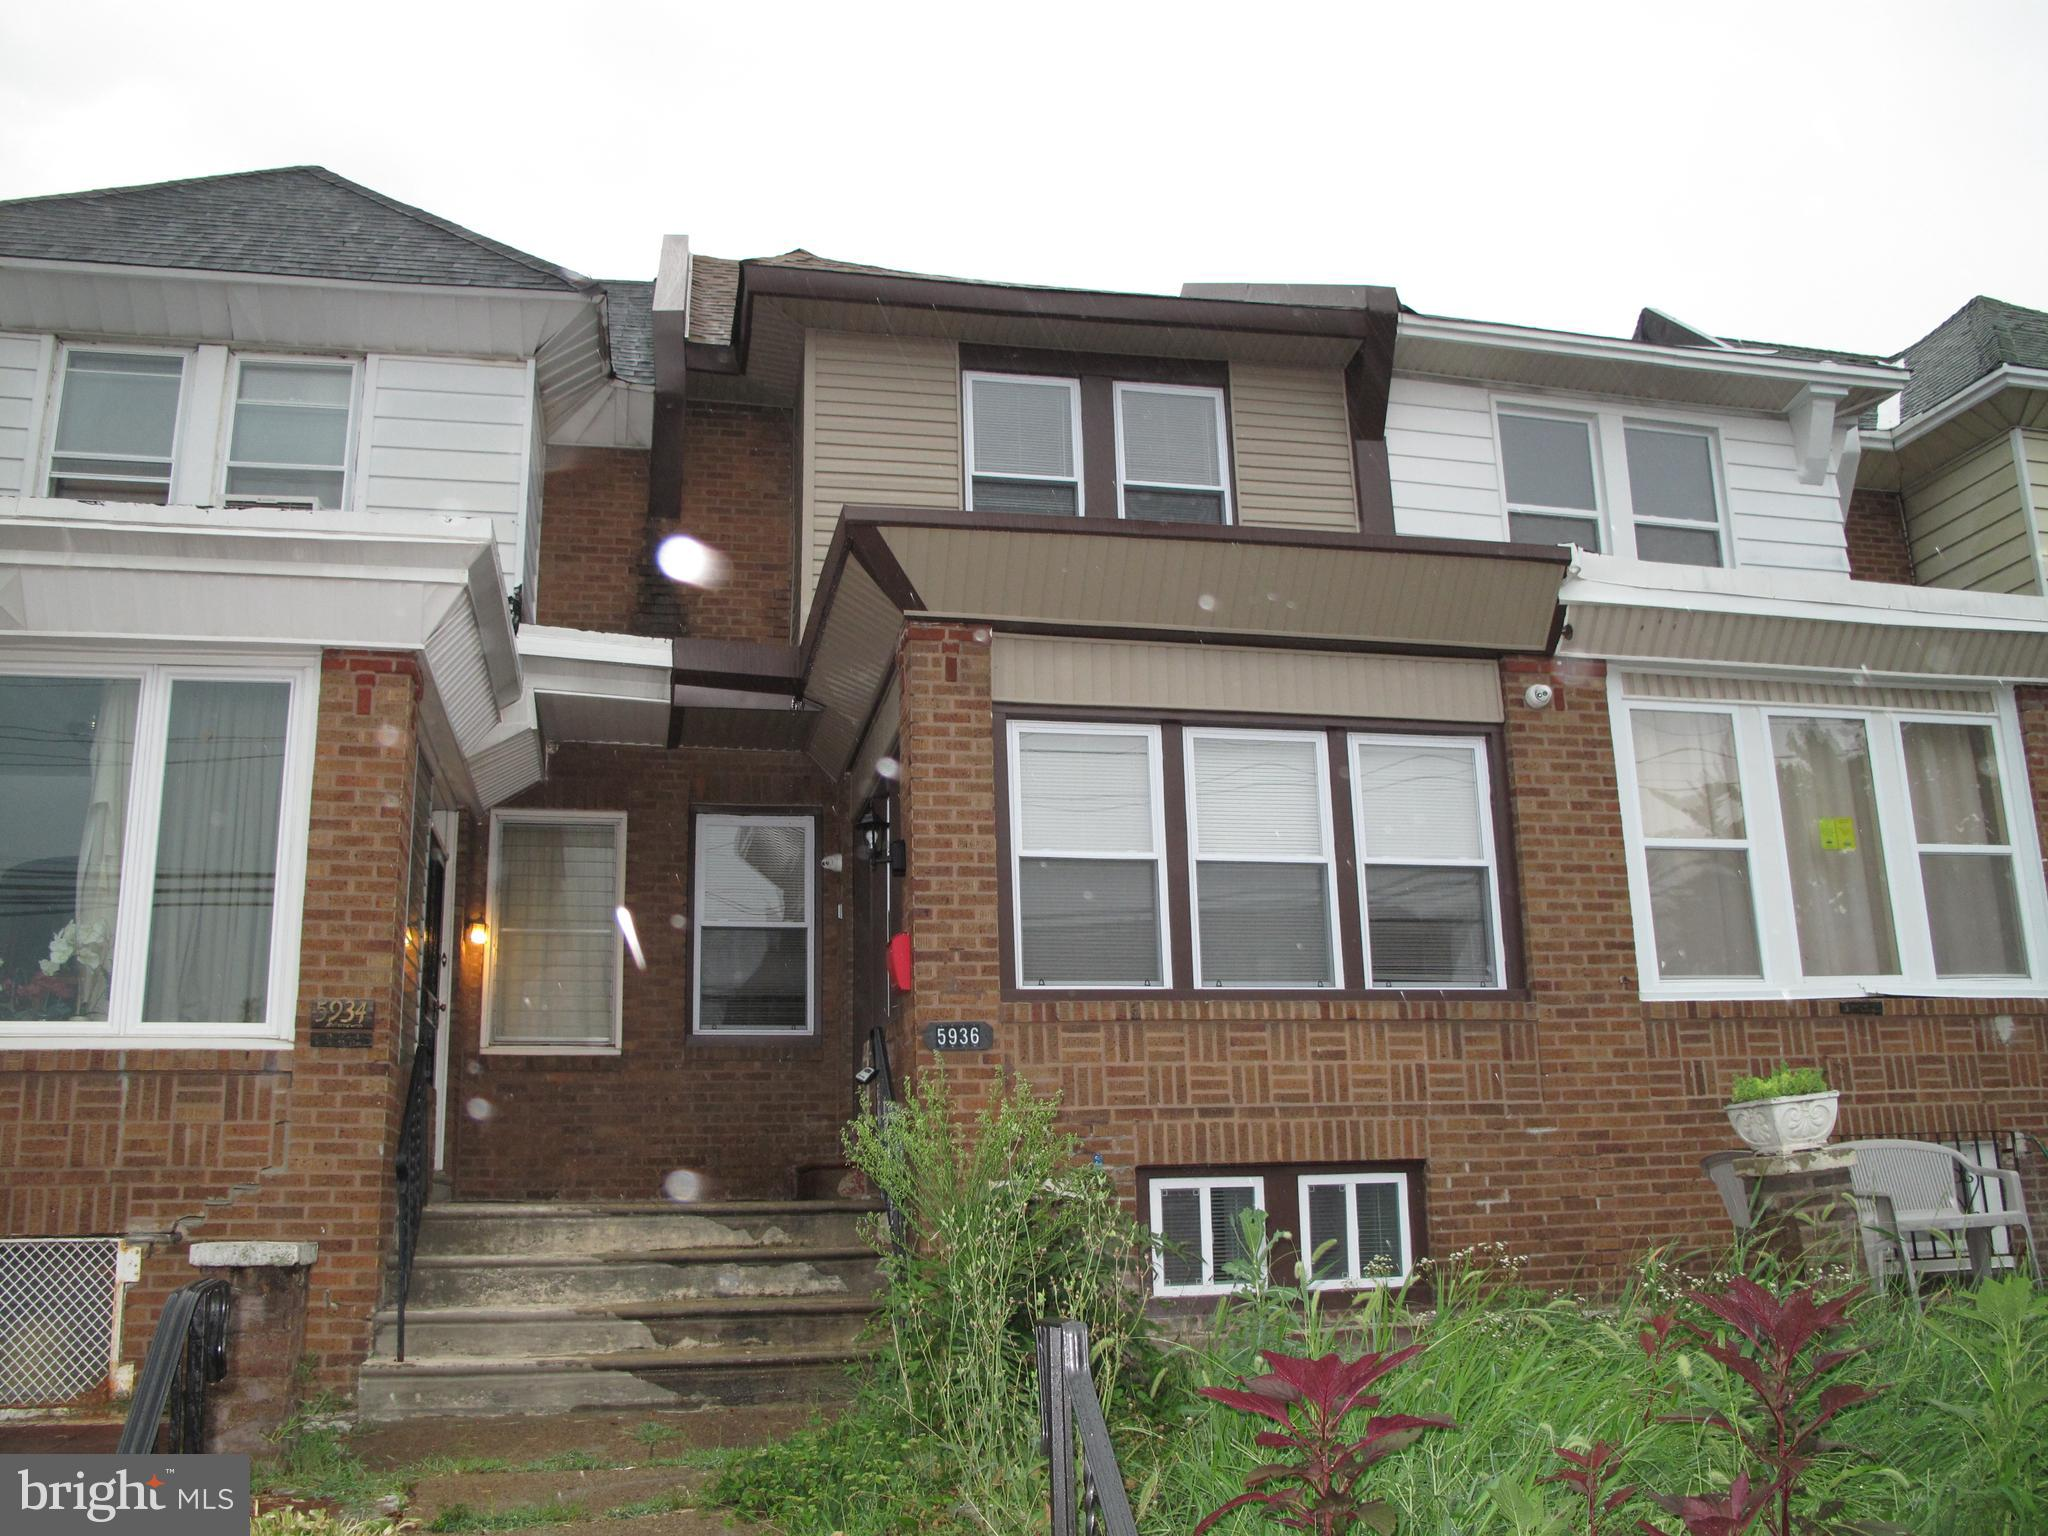 5936 N 19TH STREET, PHILADELPHIA, PA 19141